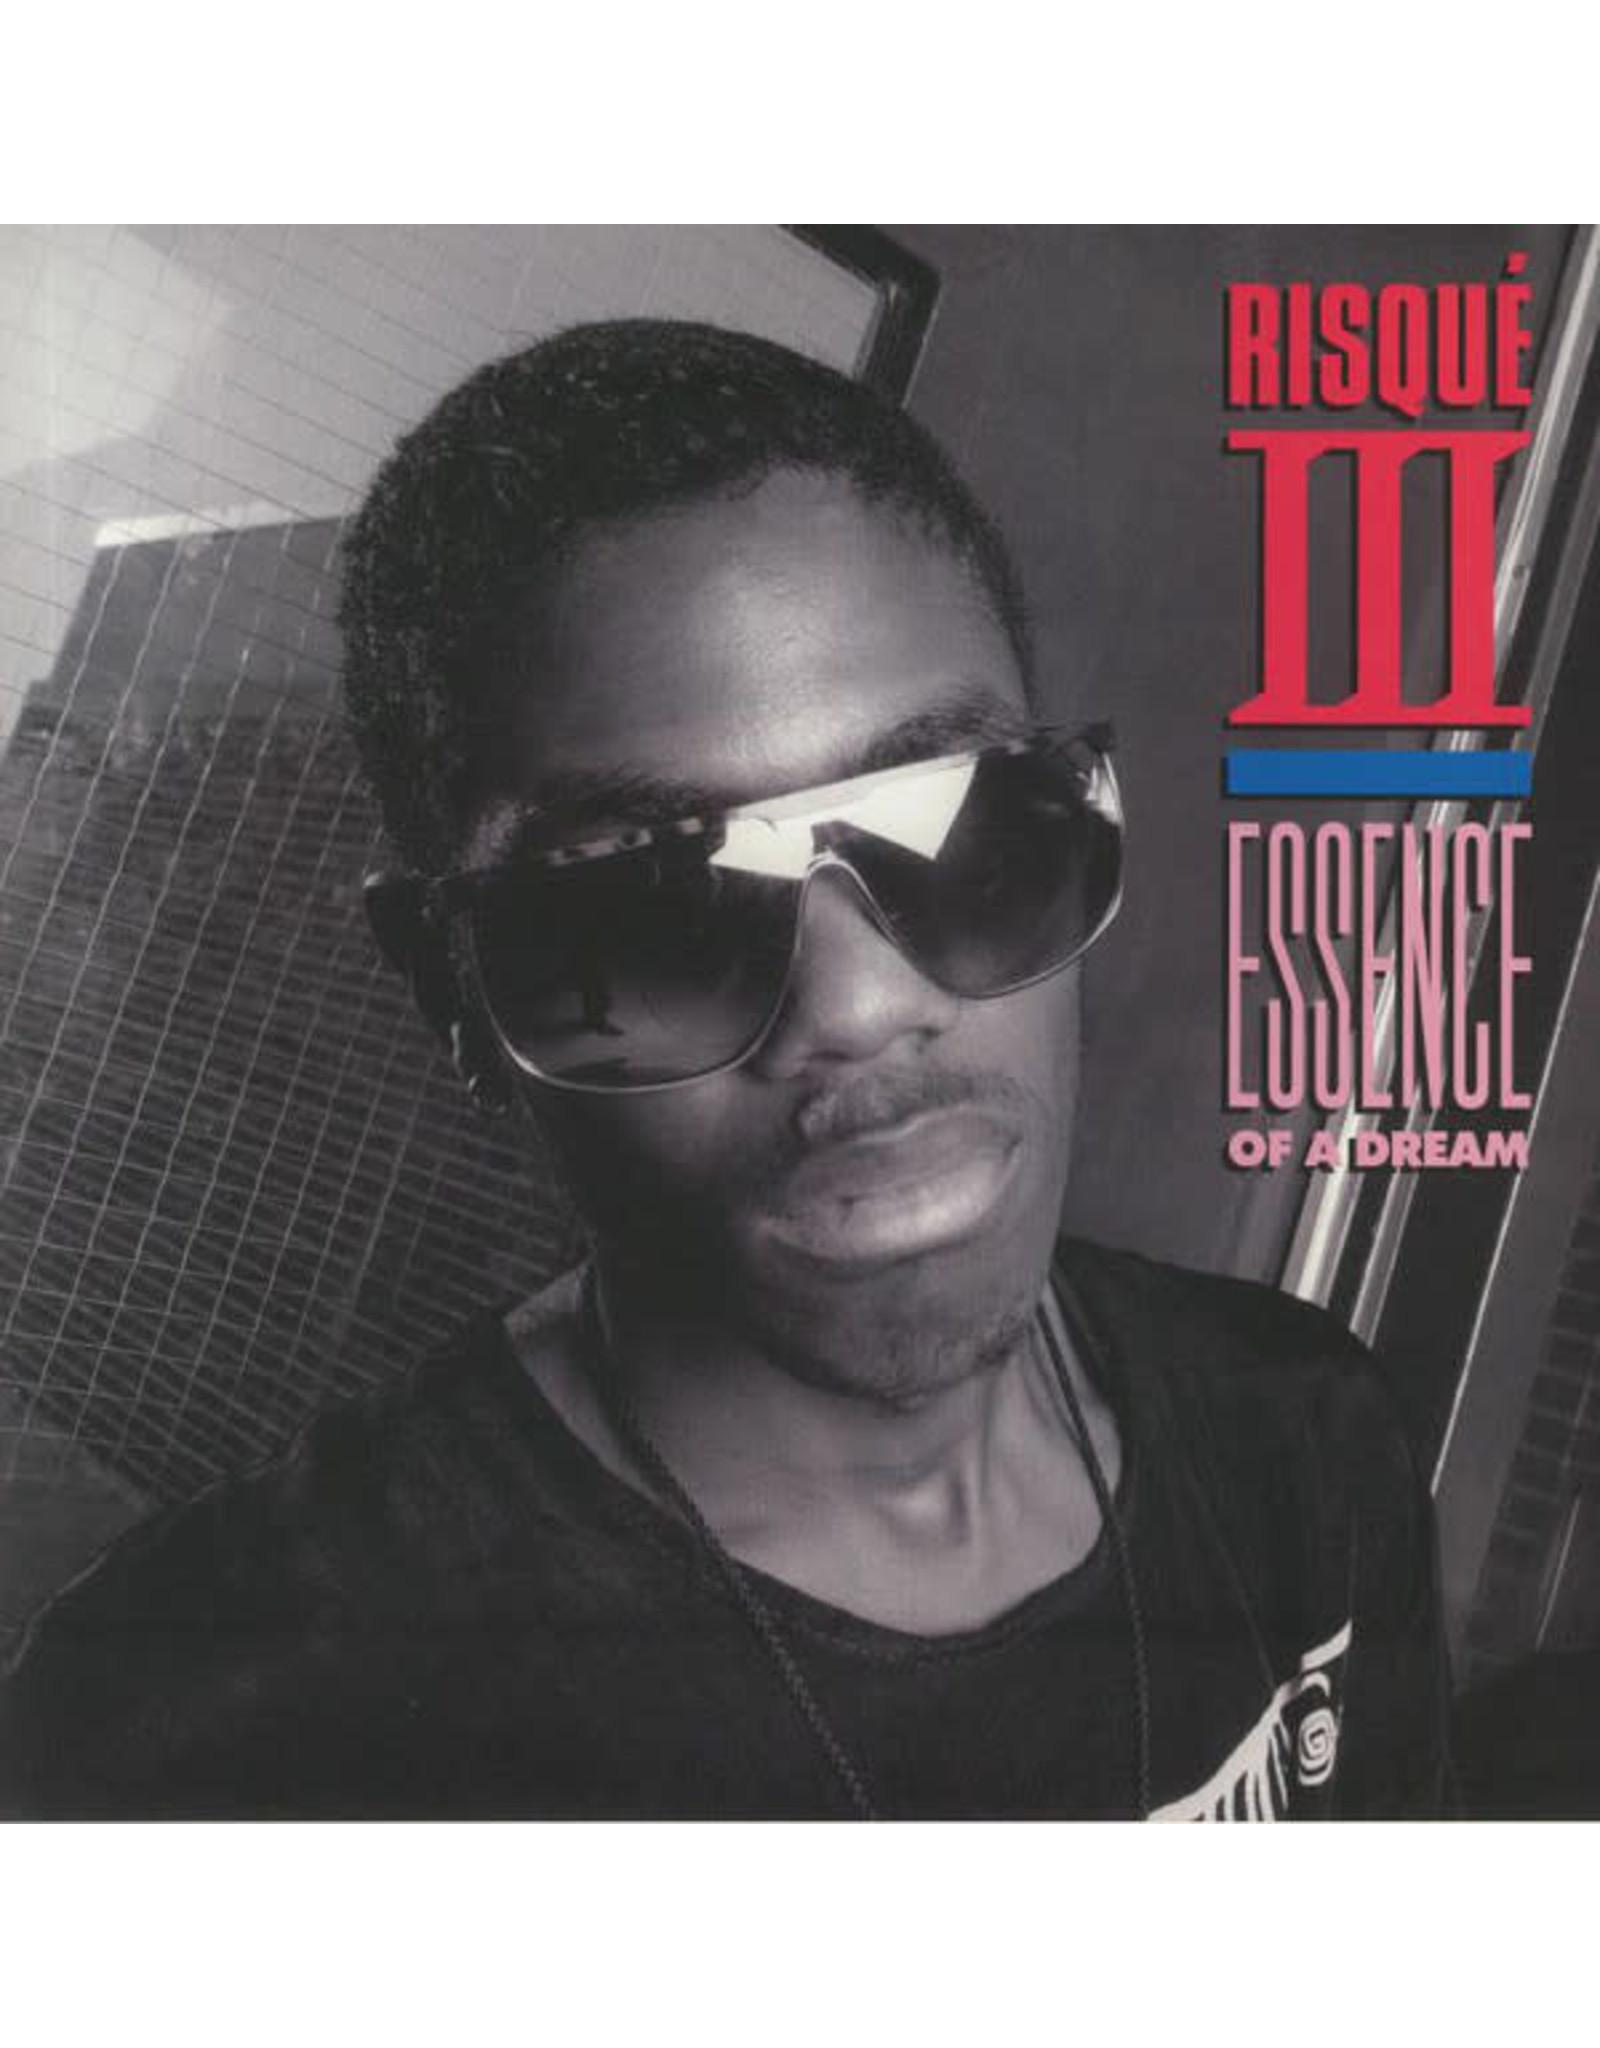 "New Vinyl Risque III - Essence Of A Dream 12"""